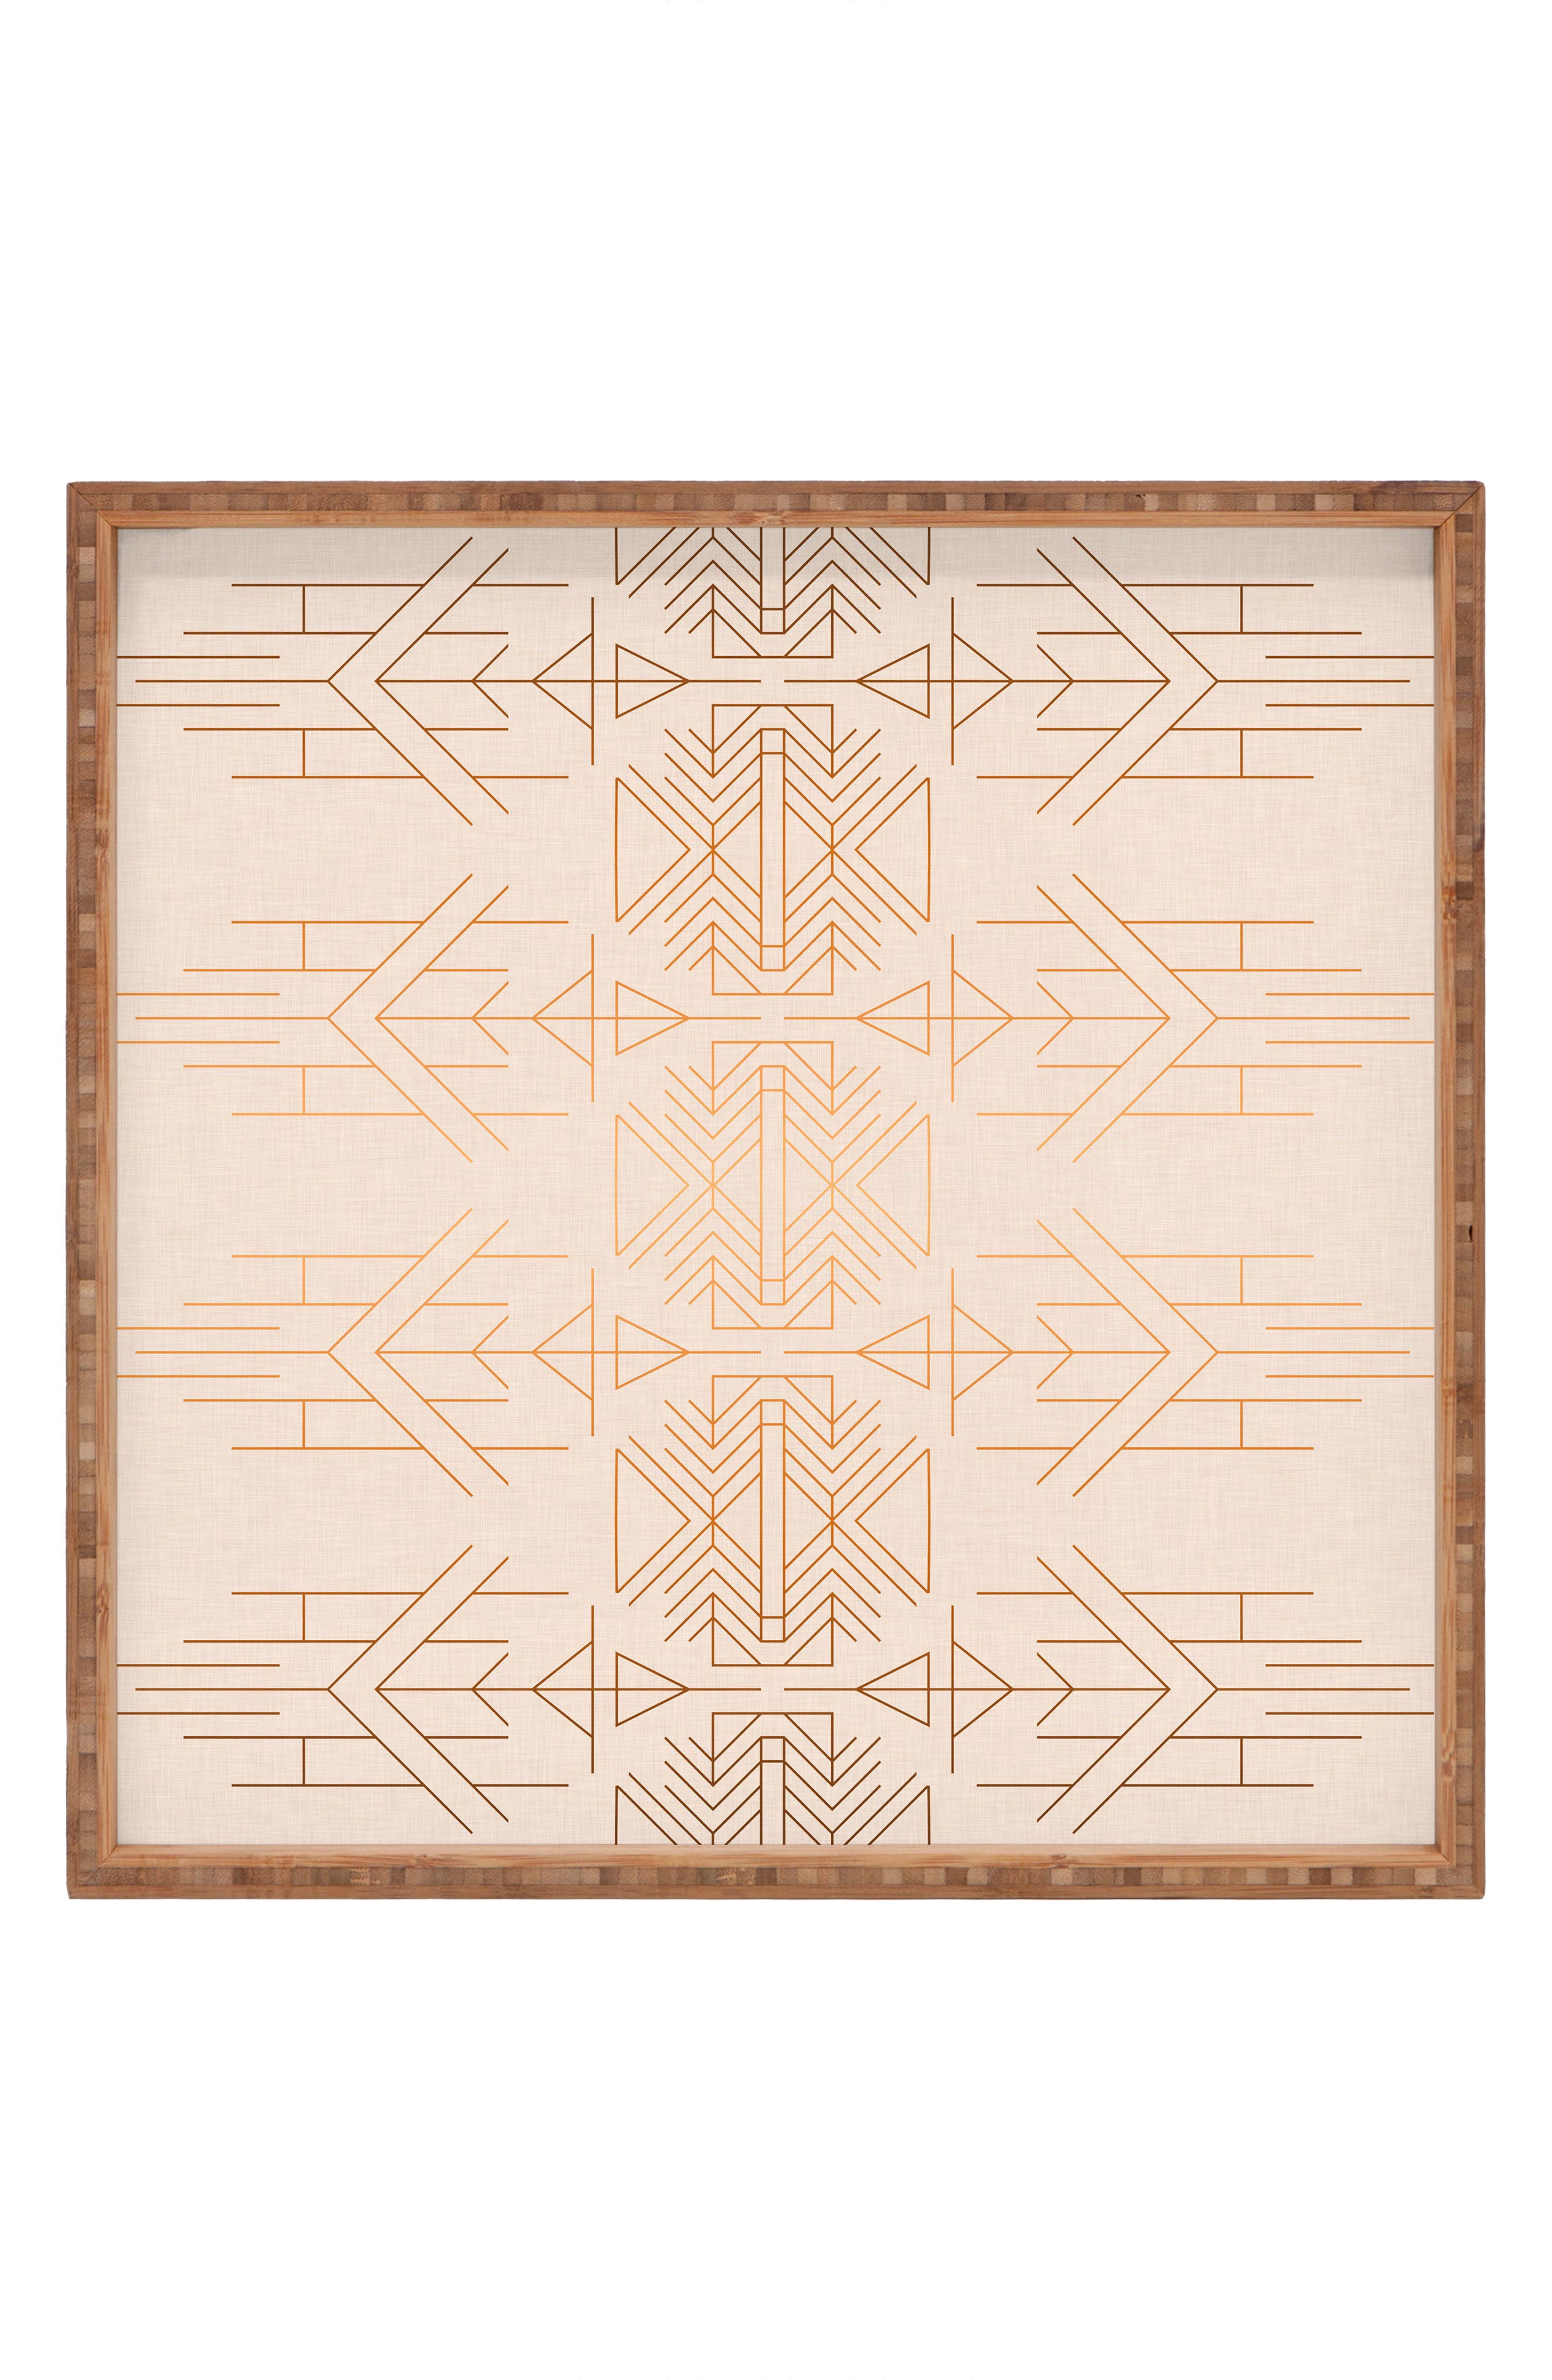 DENY Designs Holli Zollinger - Espirit Decorative Tray